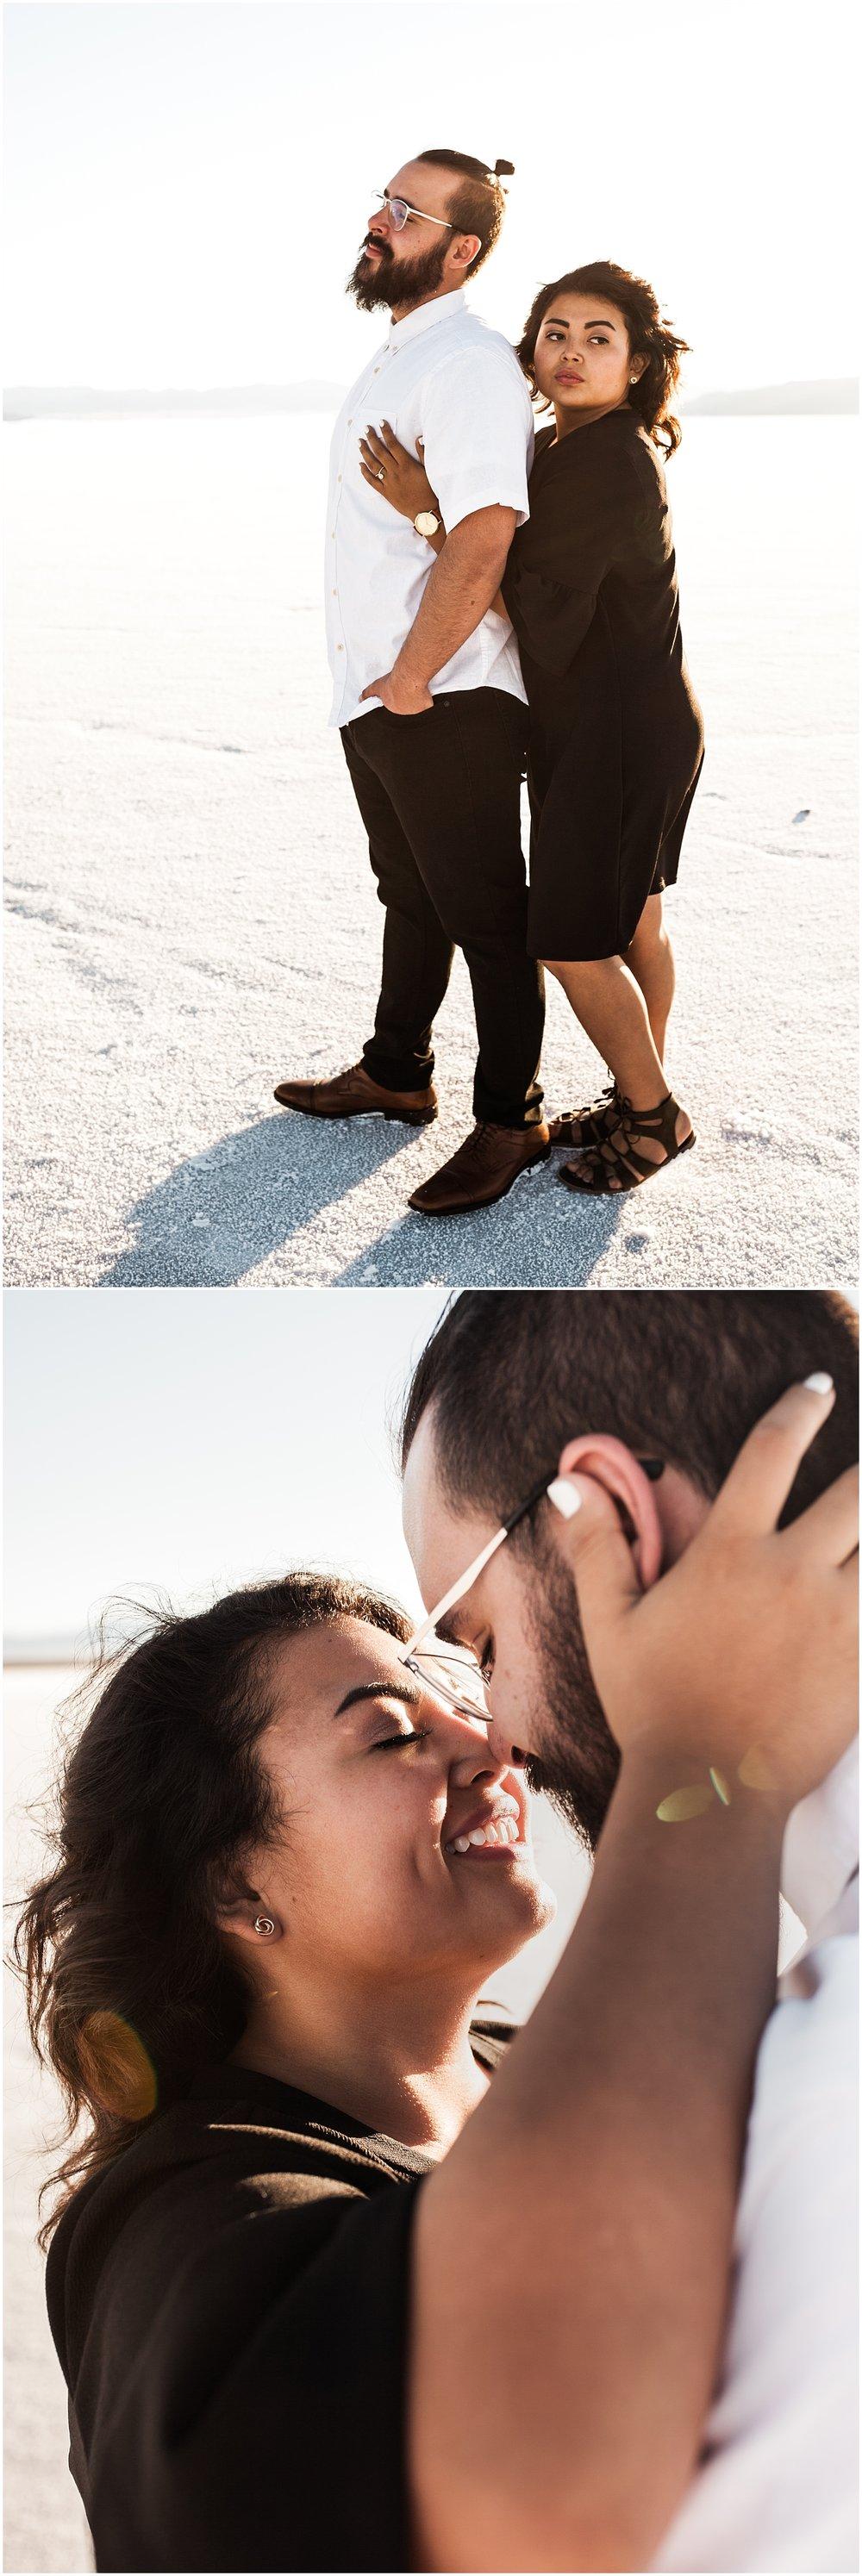 Rachel Reyes Photography-Lupita & Gabe Engagements (10).jpg